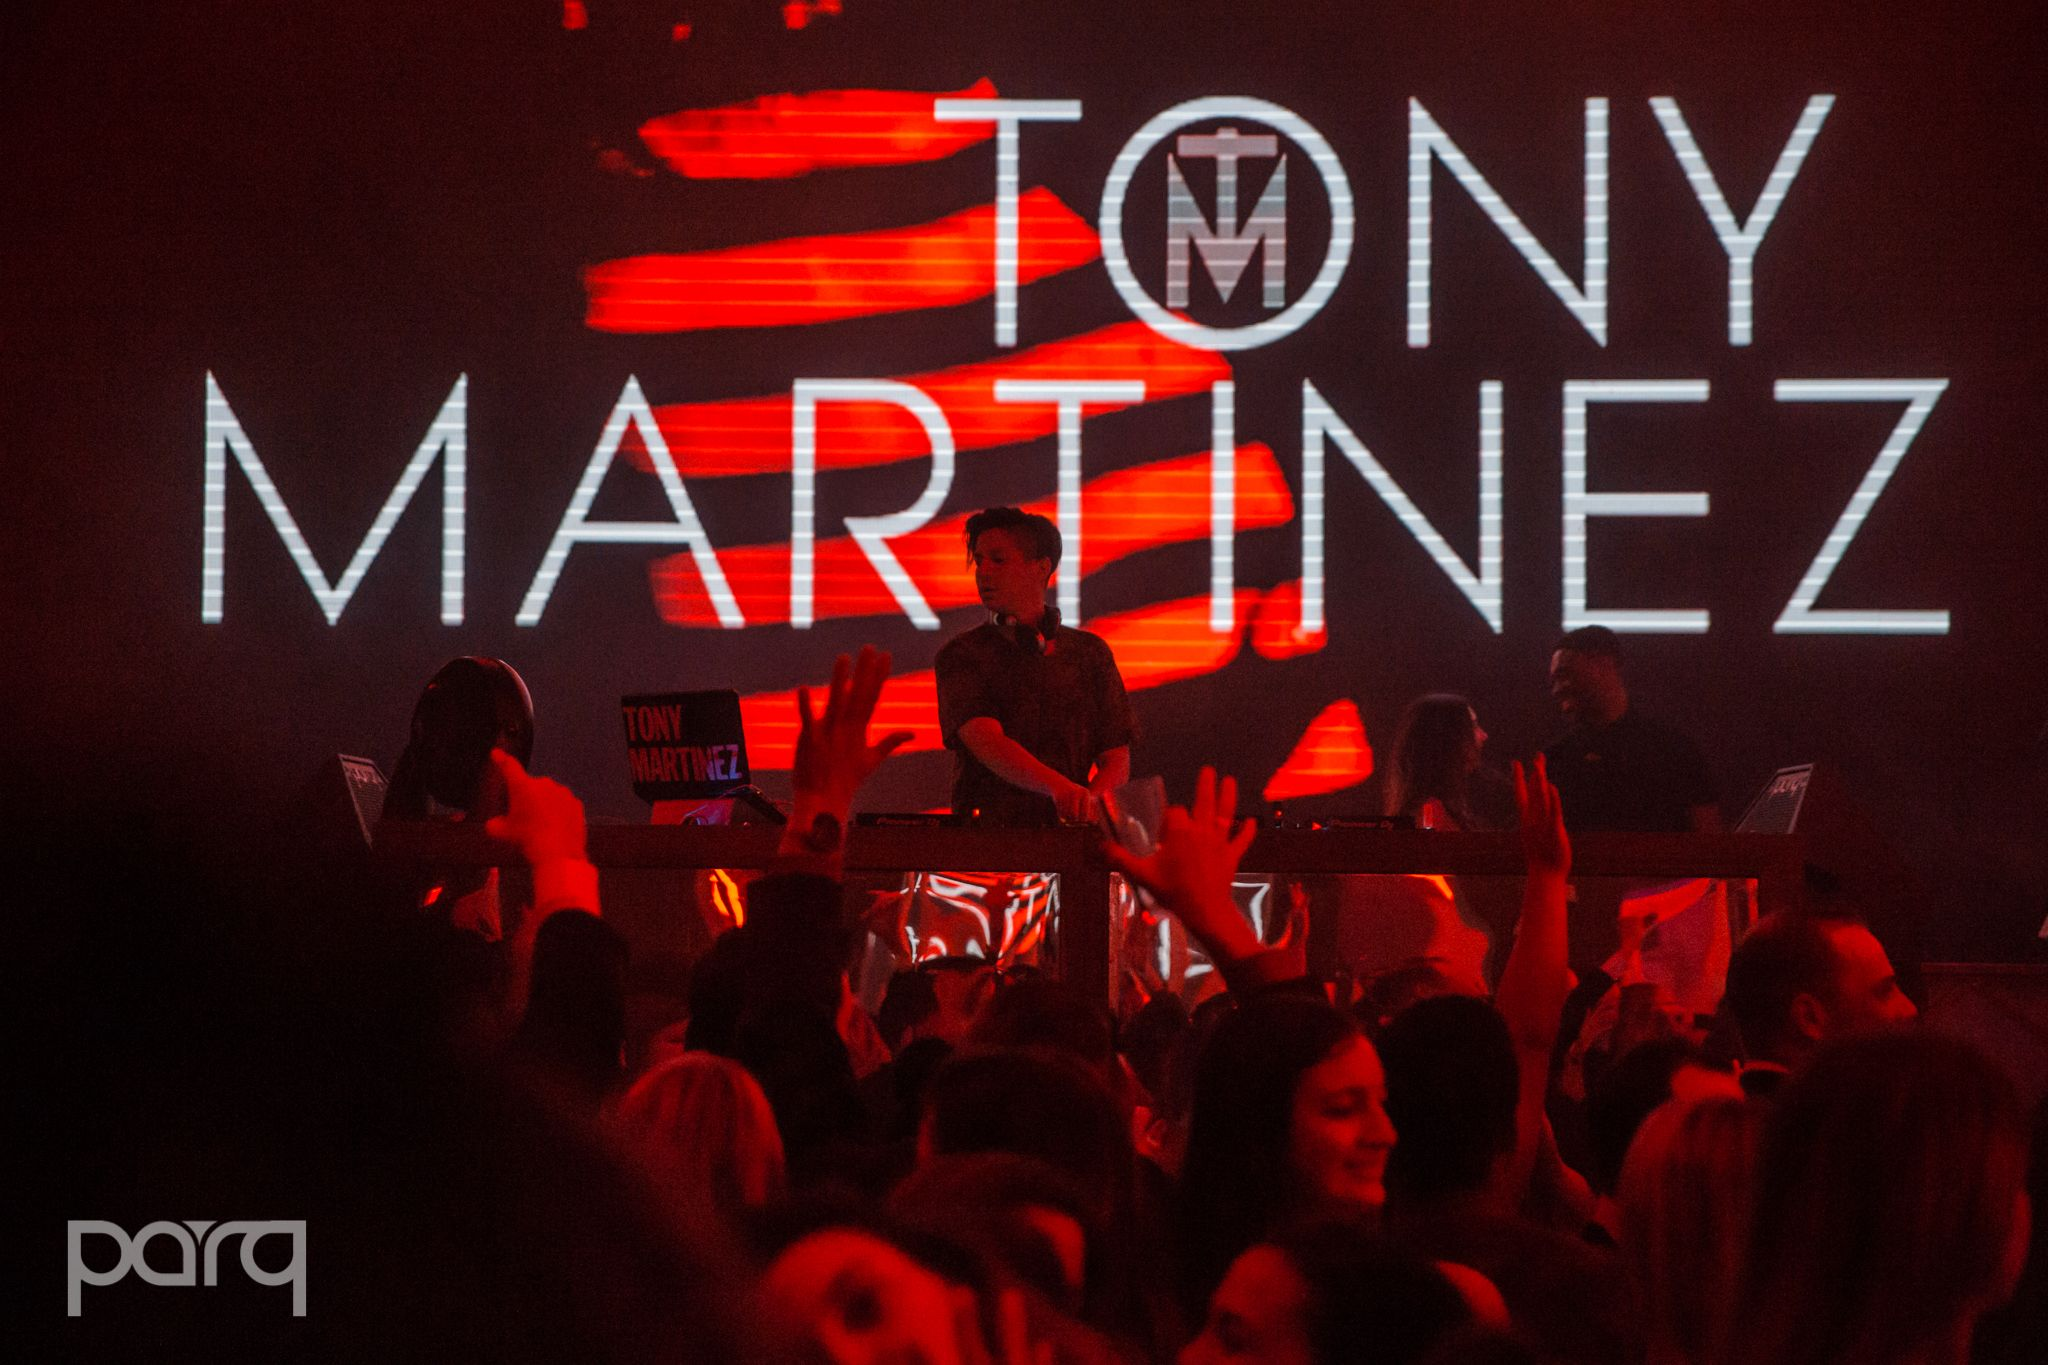 09.14.18 Parq - Tony Martinez-17.jpg